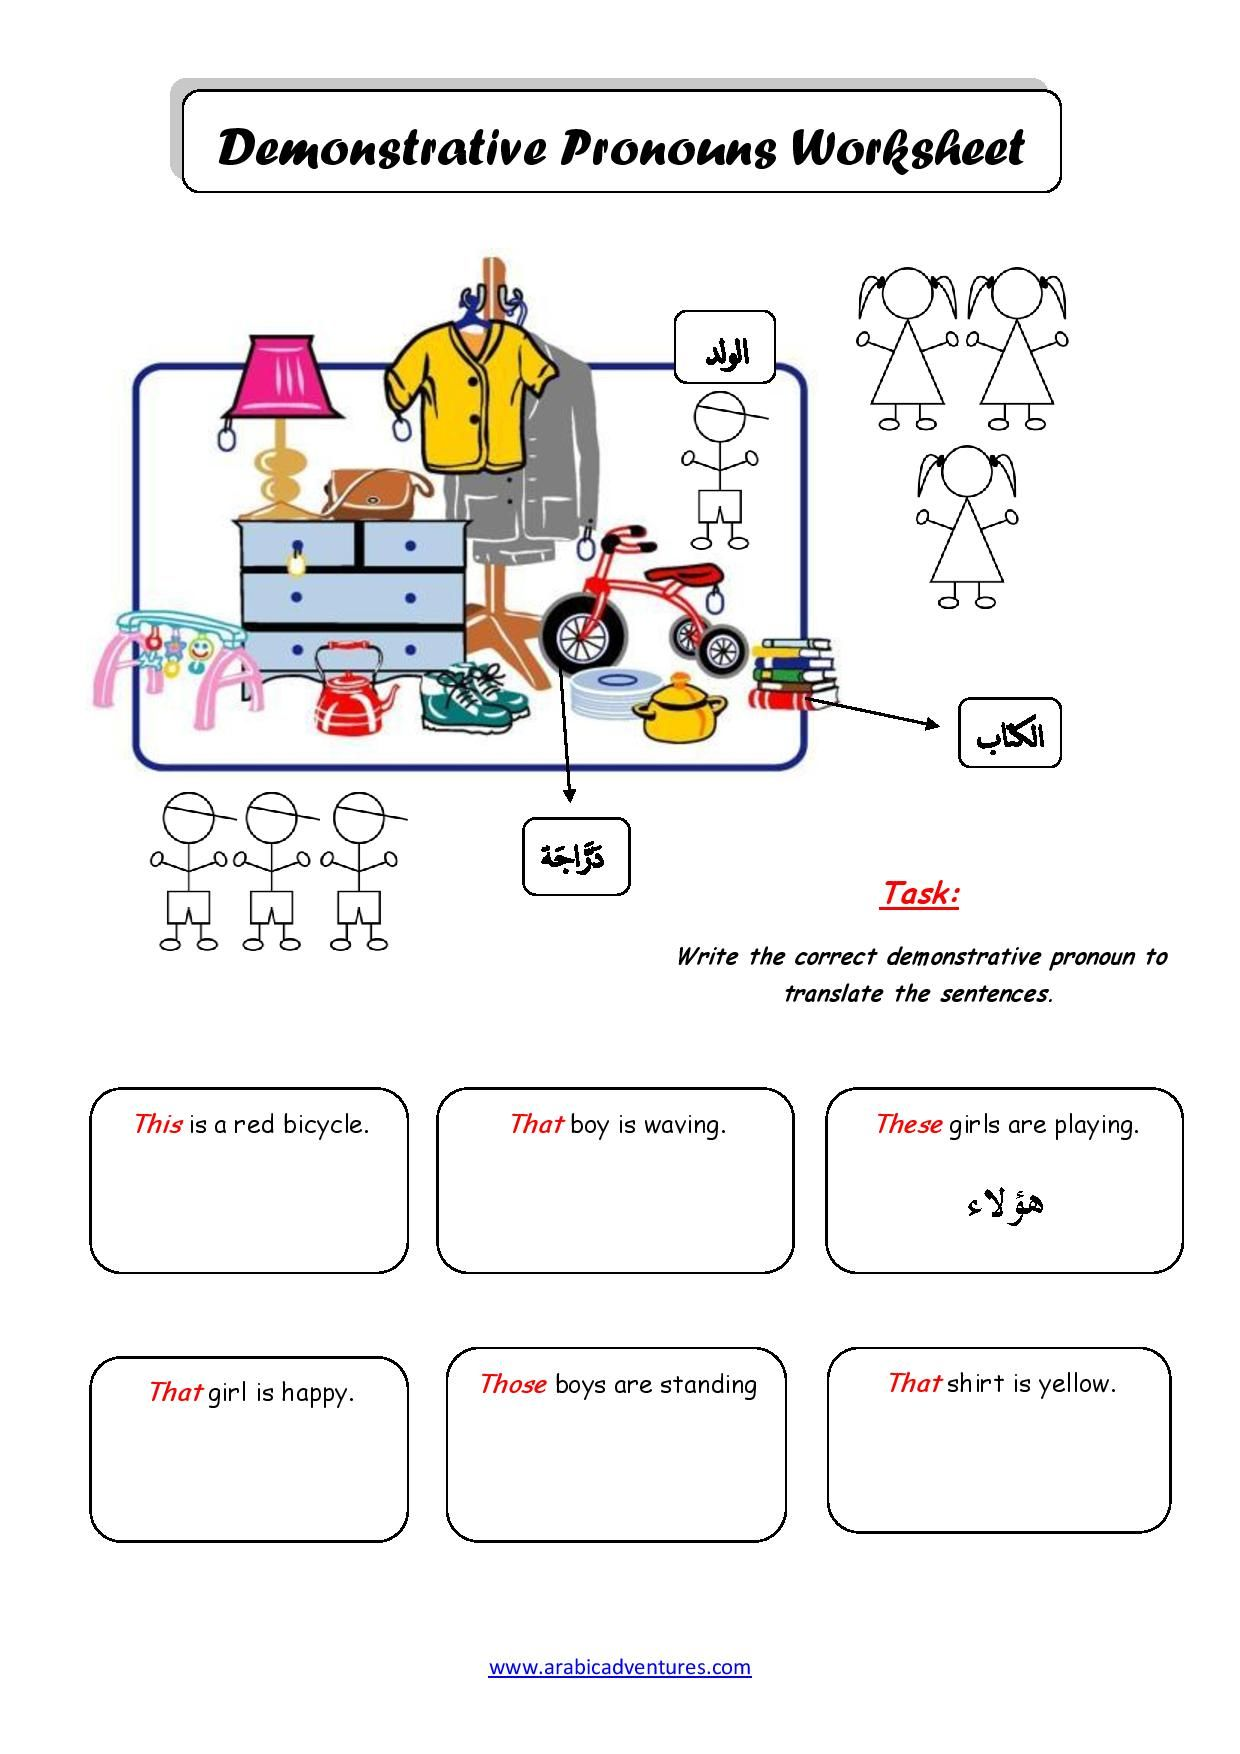 medium resolution of Arabic Demonstrative pronoun worksheet. Free printable at  www.arabicadventures.com   Pronoun worksheets